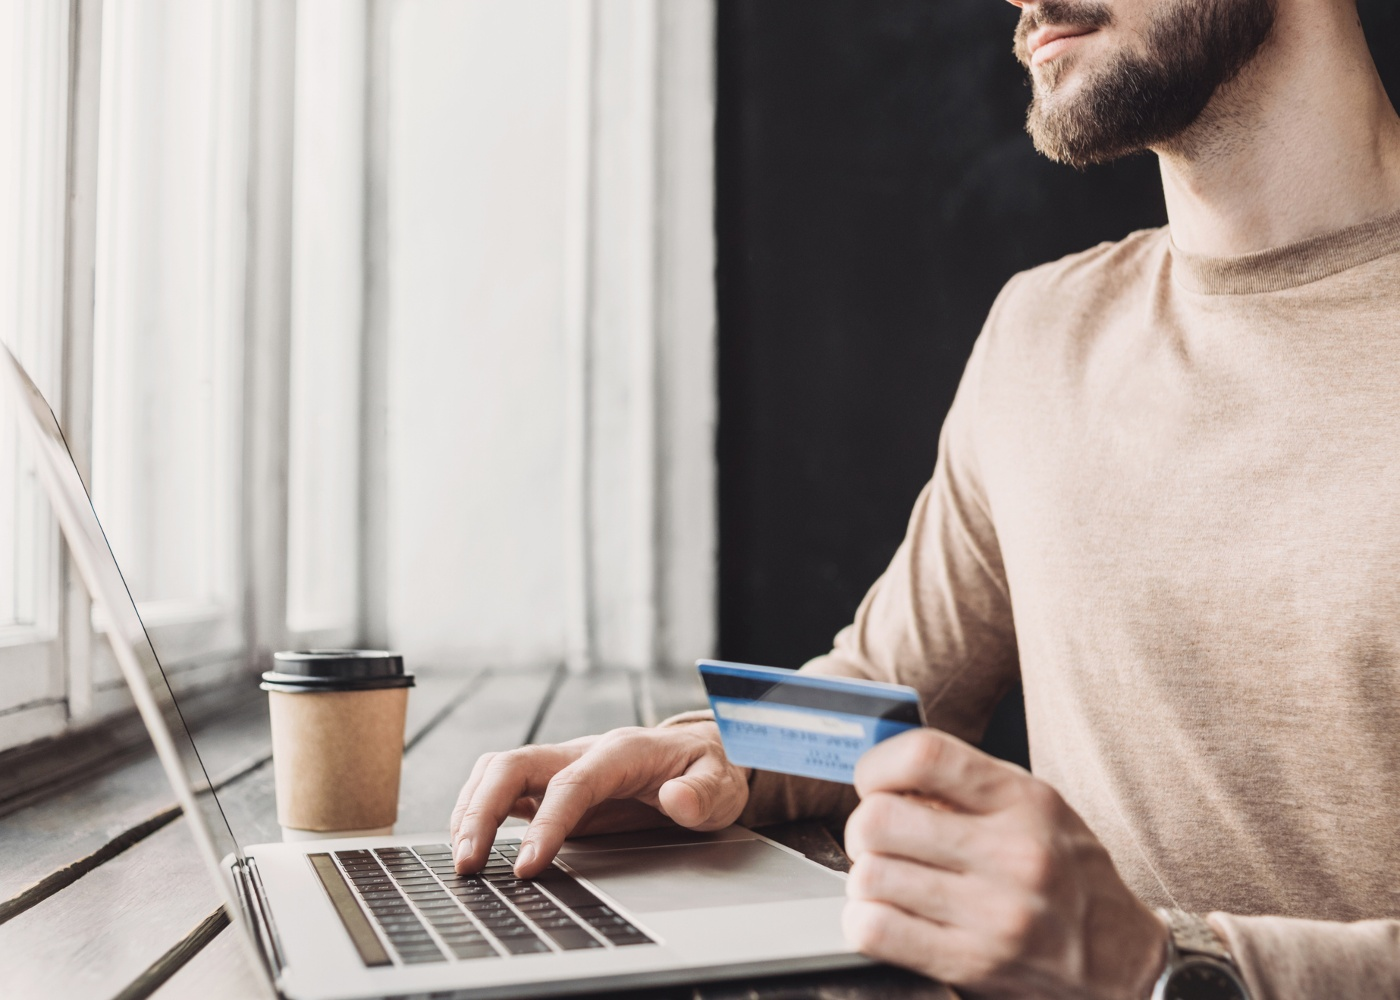 conta bancária online